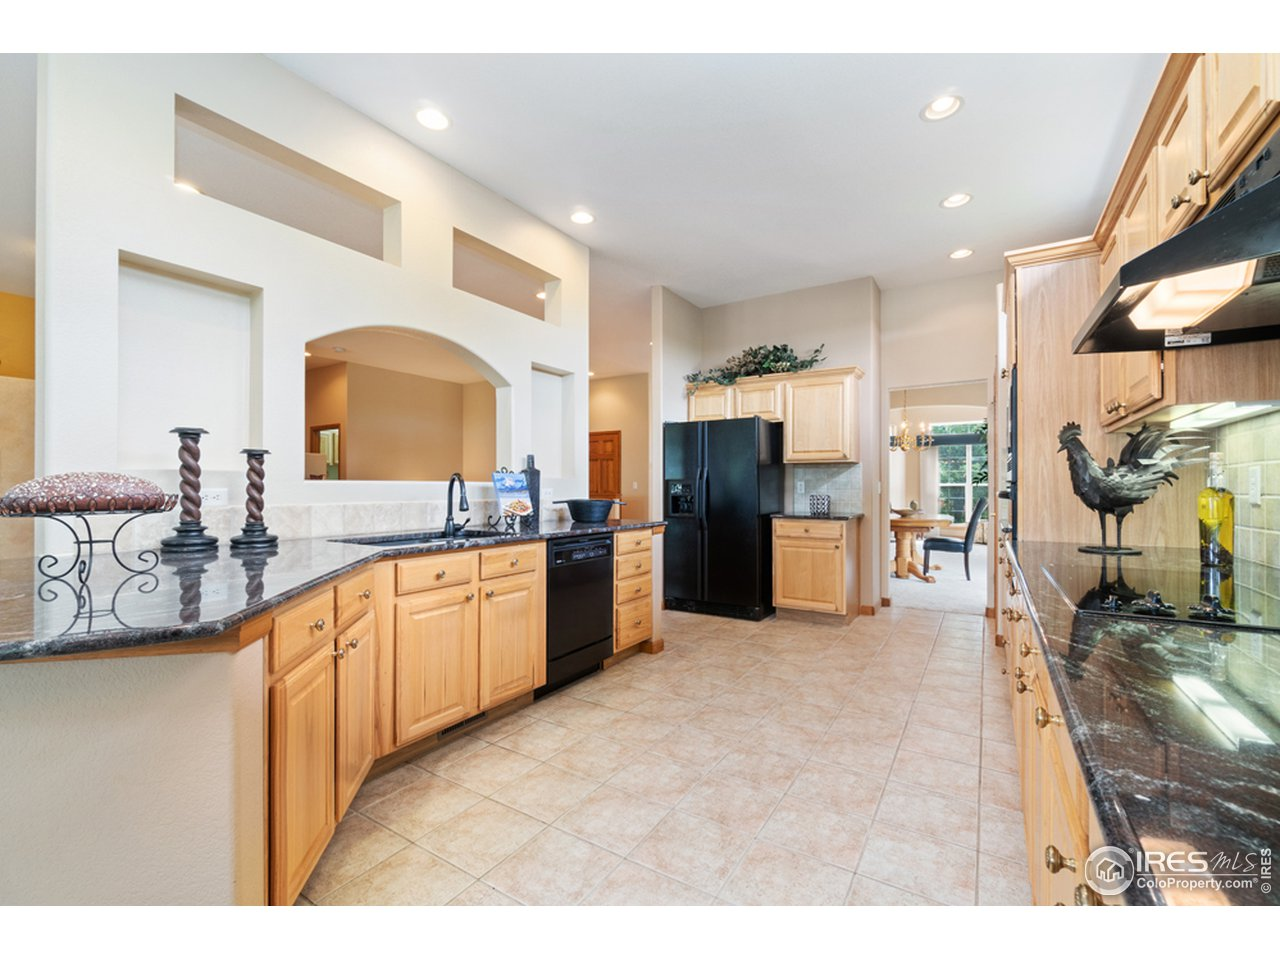 Amazing Kitchen with Granite Countertops